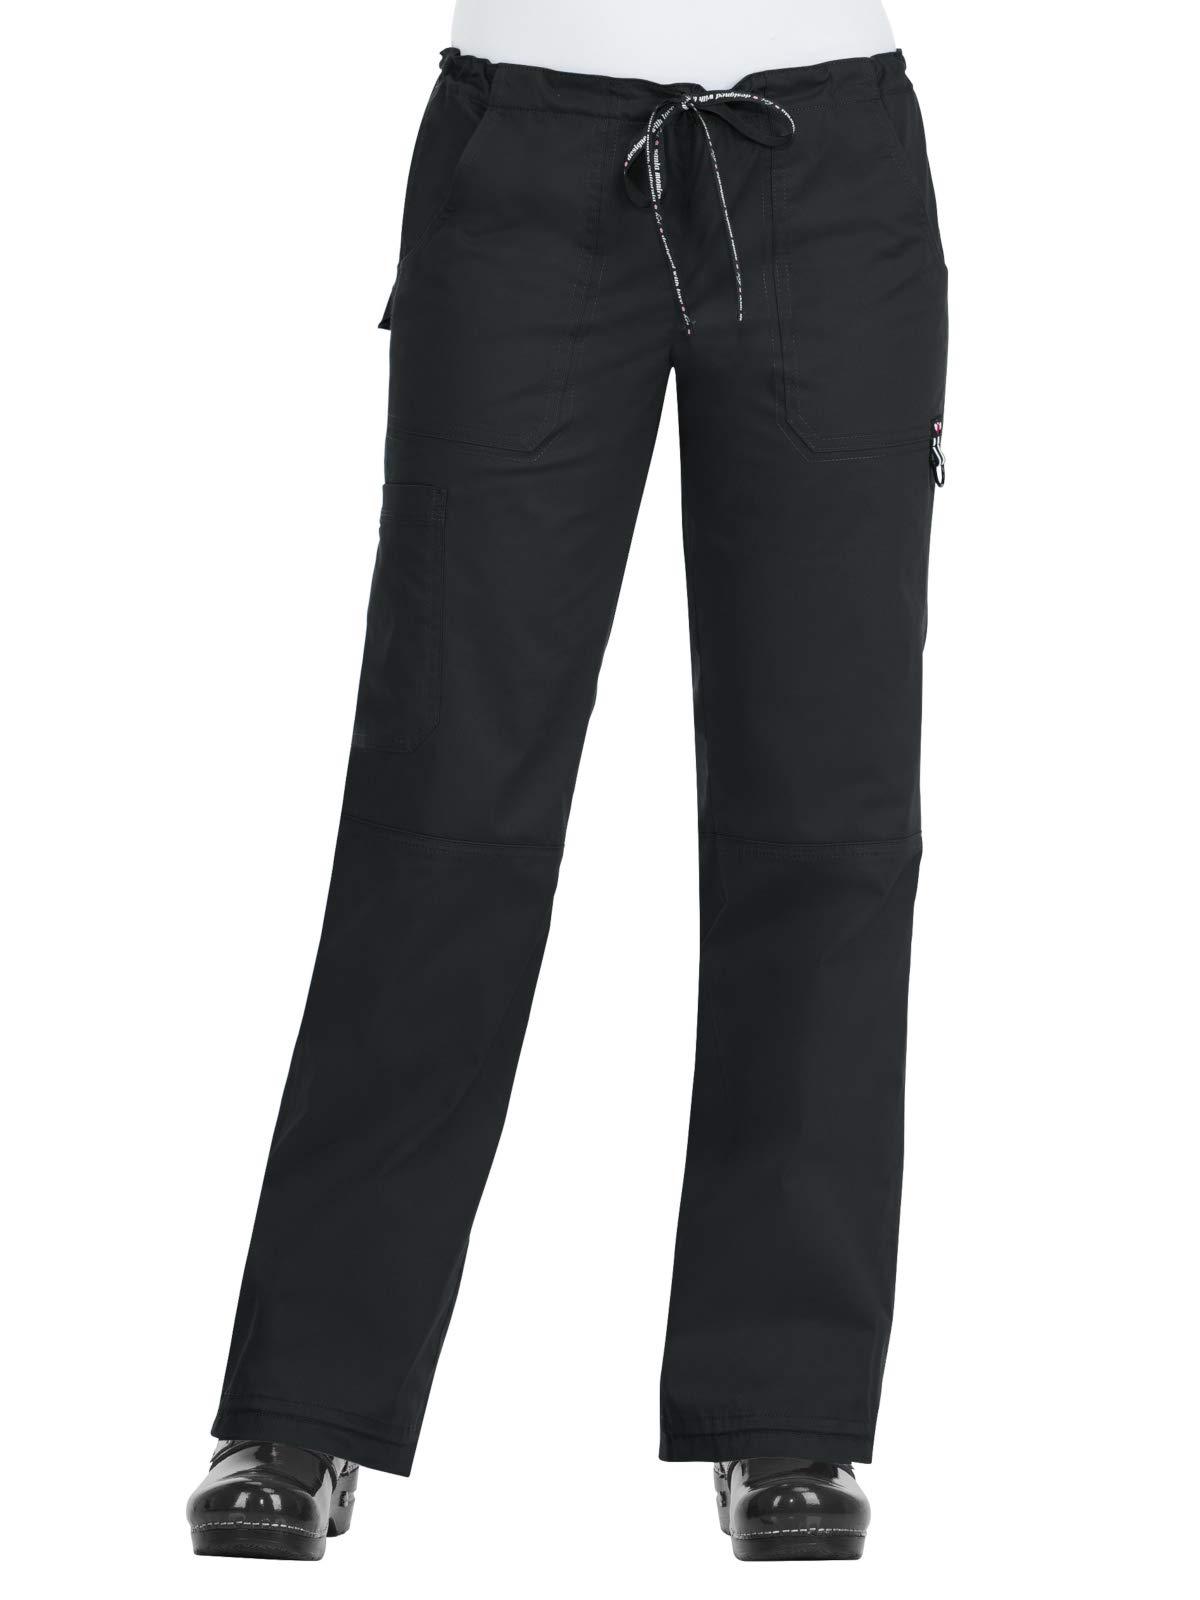 KOI Stretch Women's Straight Leg Lindsey 3.0 Scrub Pant